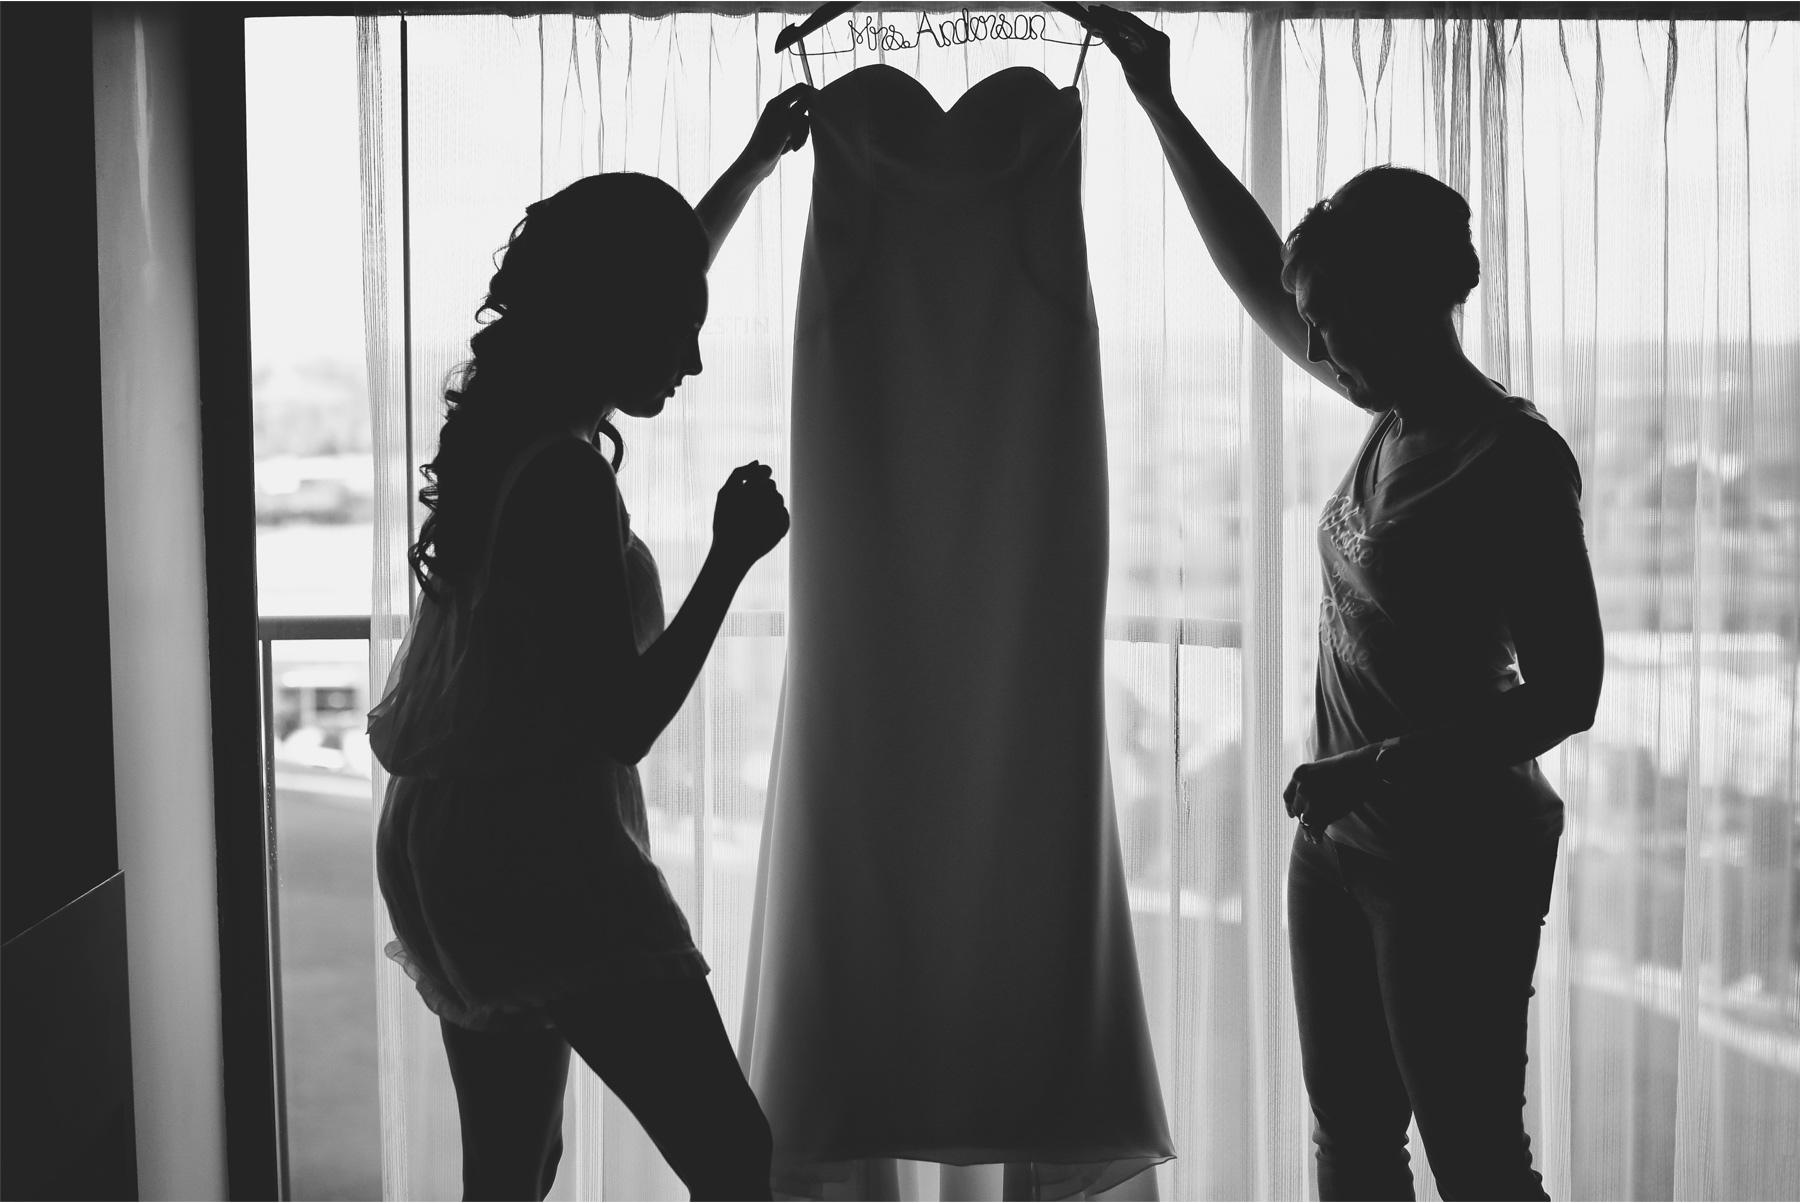 03-Kansas-City-Missouri-Destination-Wedding-Photography-by-Vick-Photography-Getting-Ready-Wedding-Dress-Carly-and-Kenny.jpg